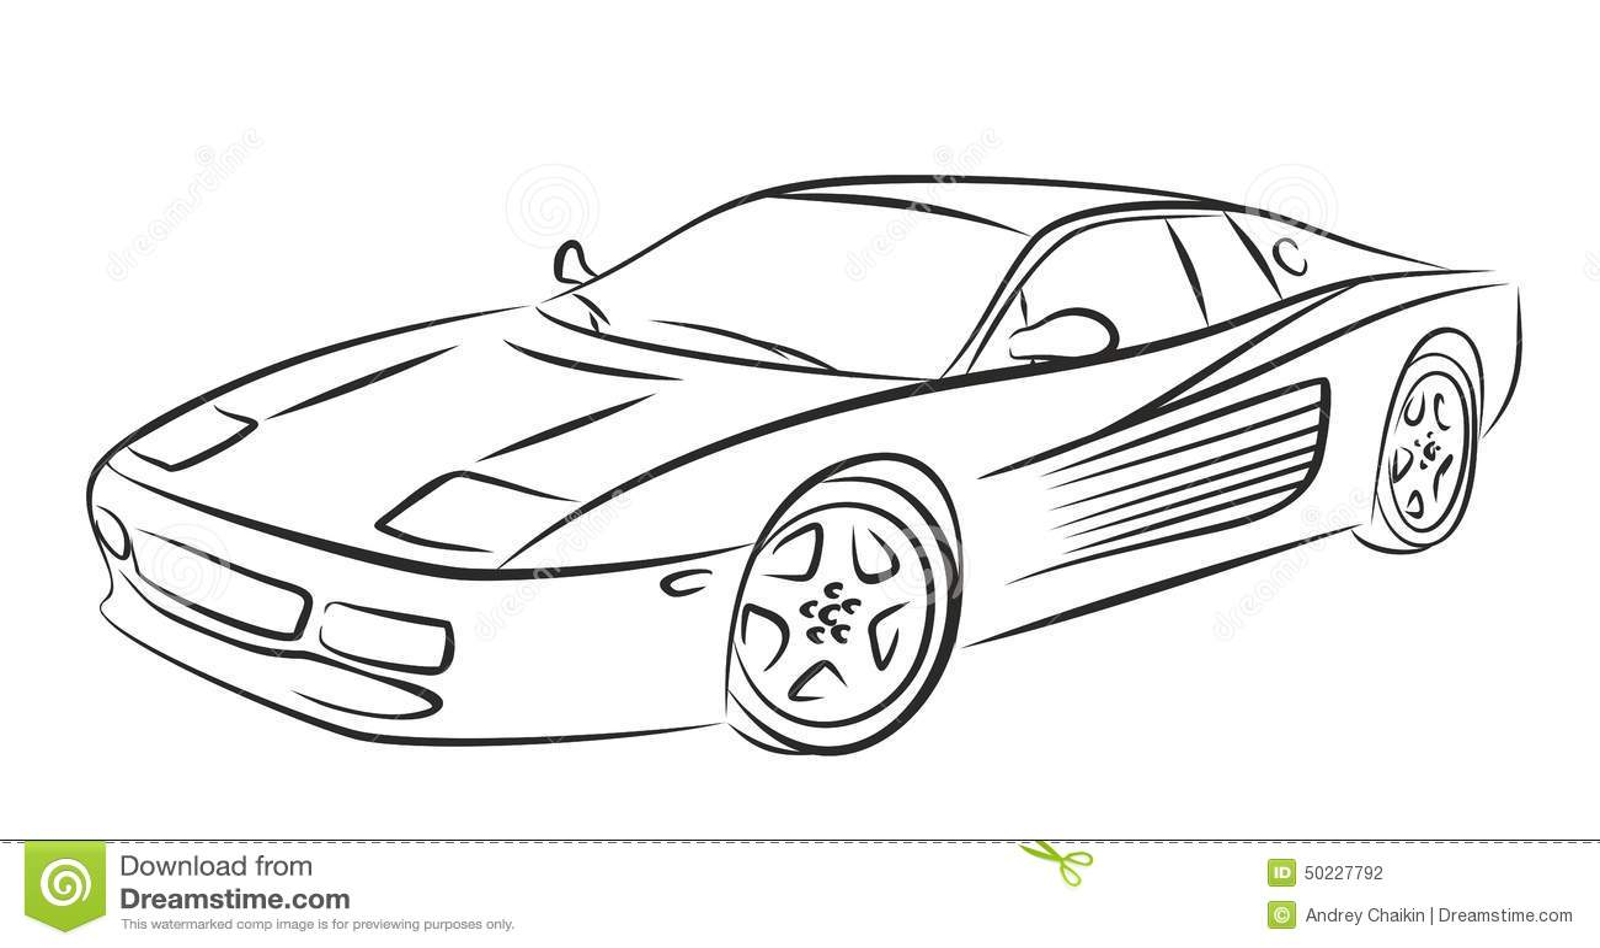 Sport car stock vect